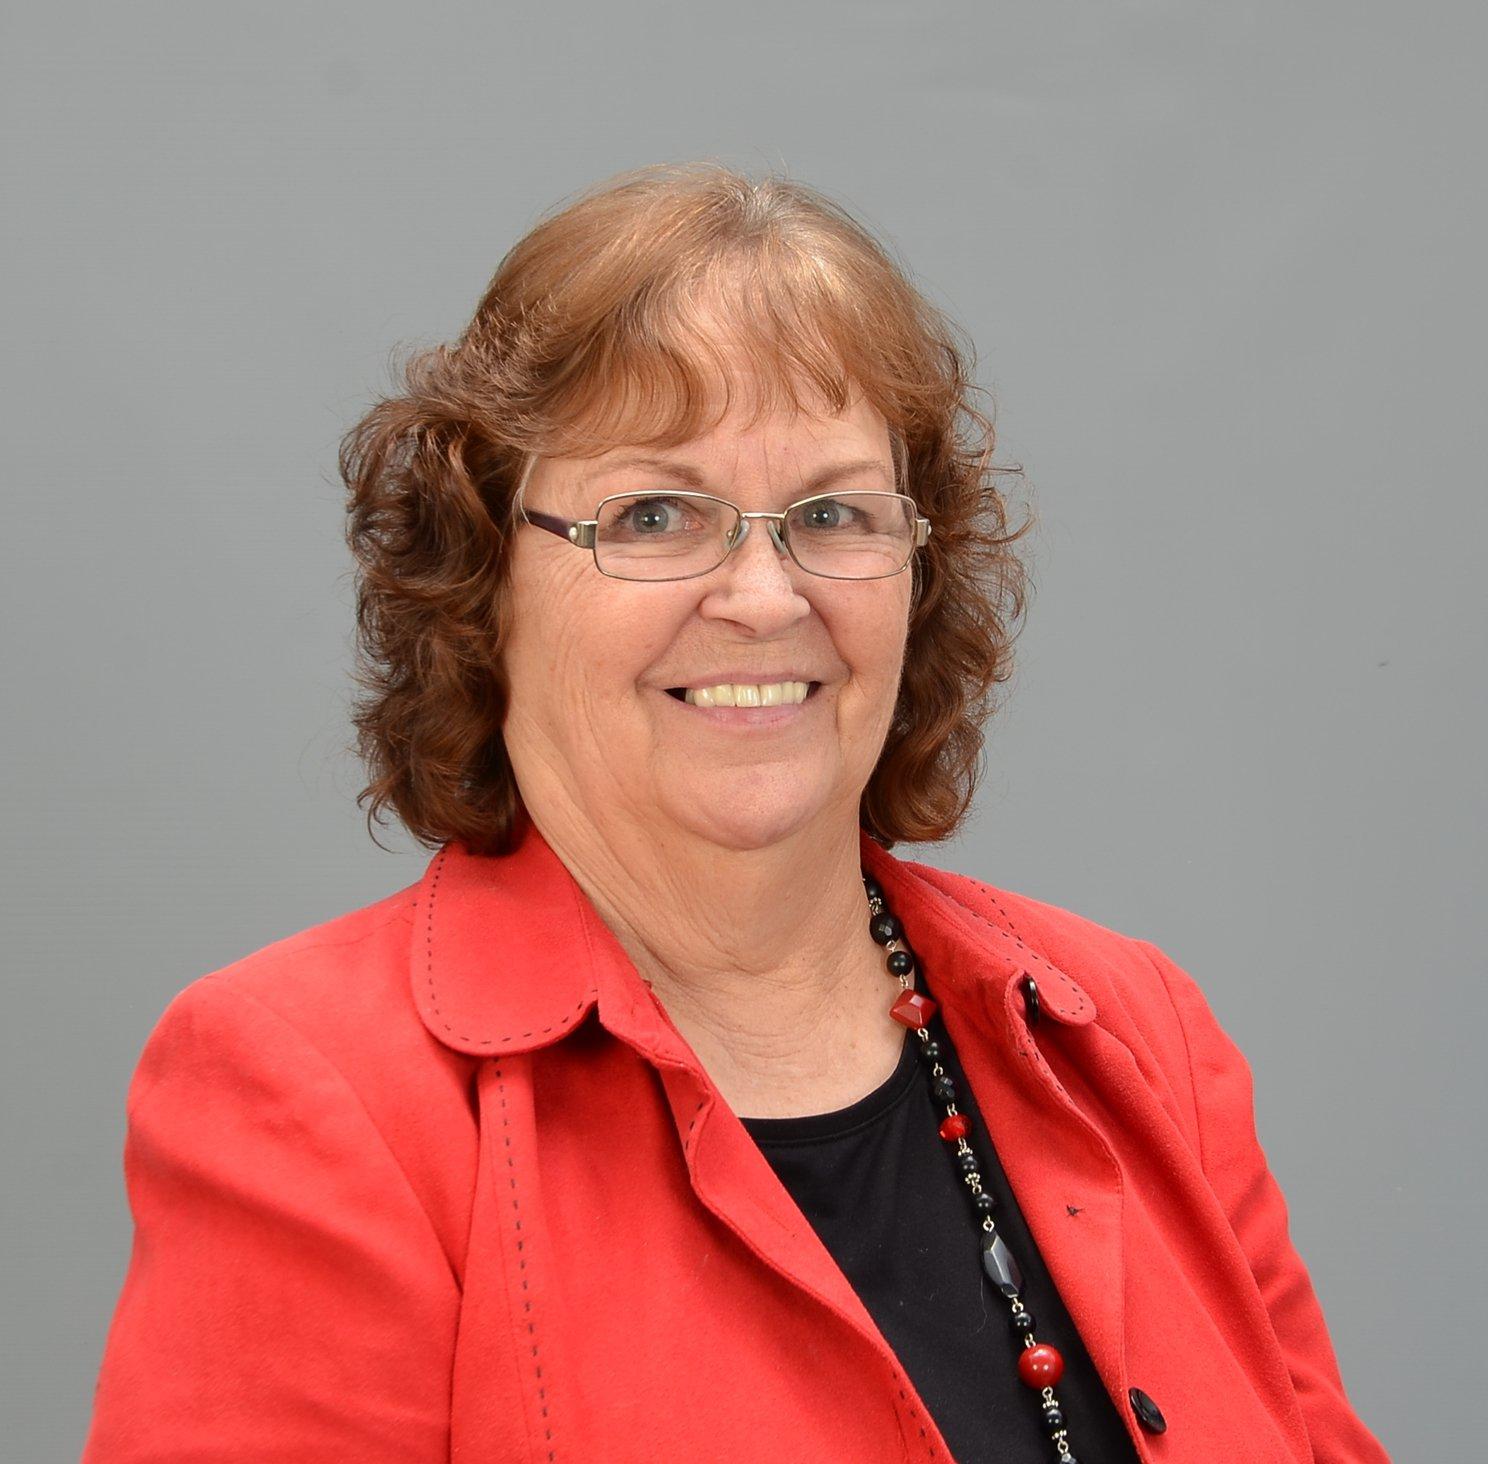 Debbie Roach